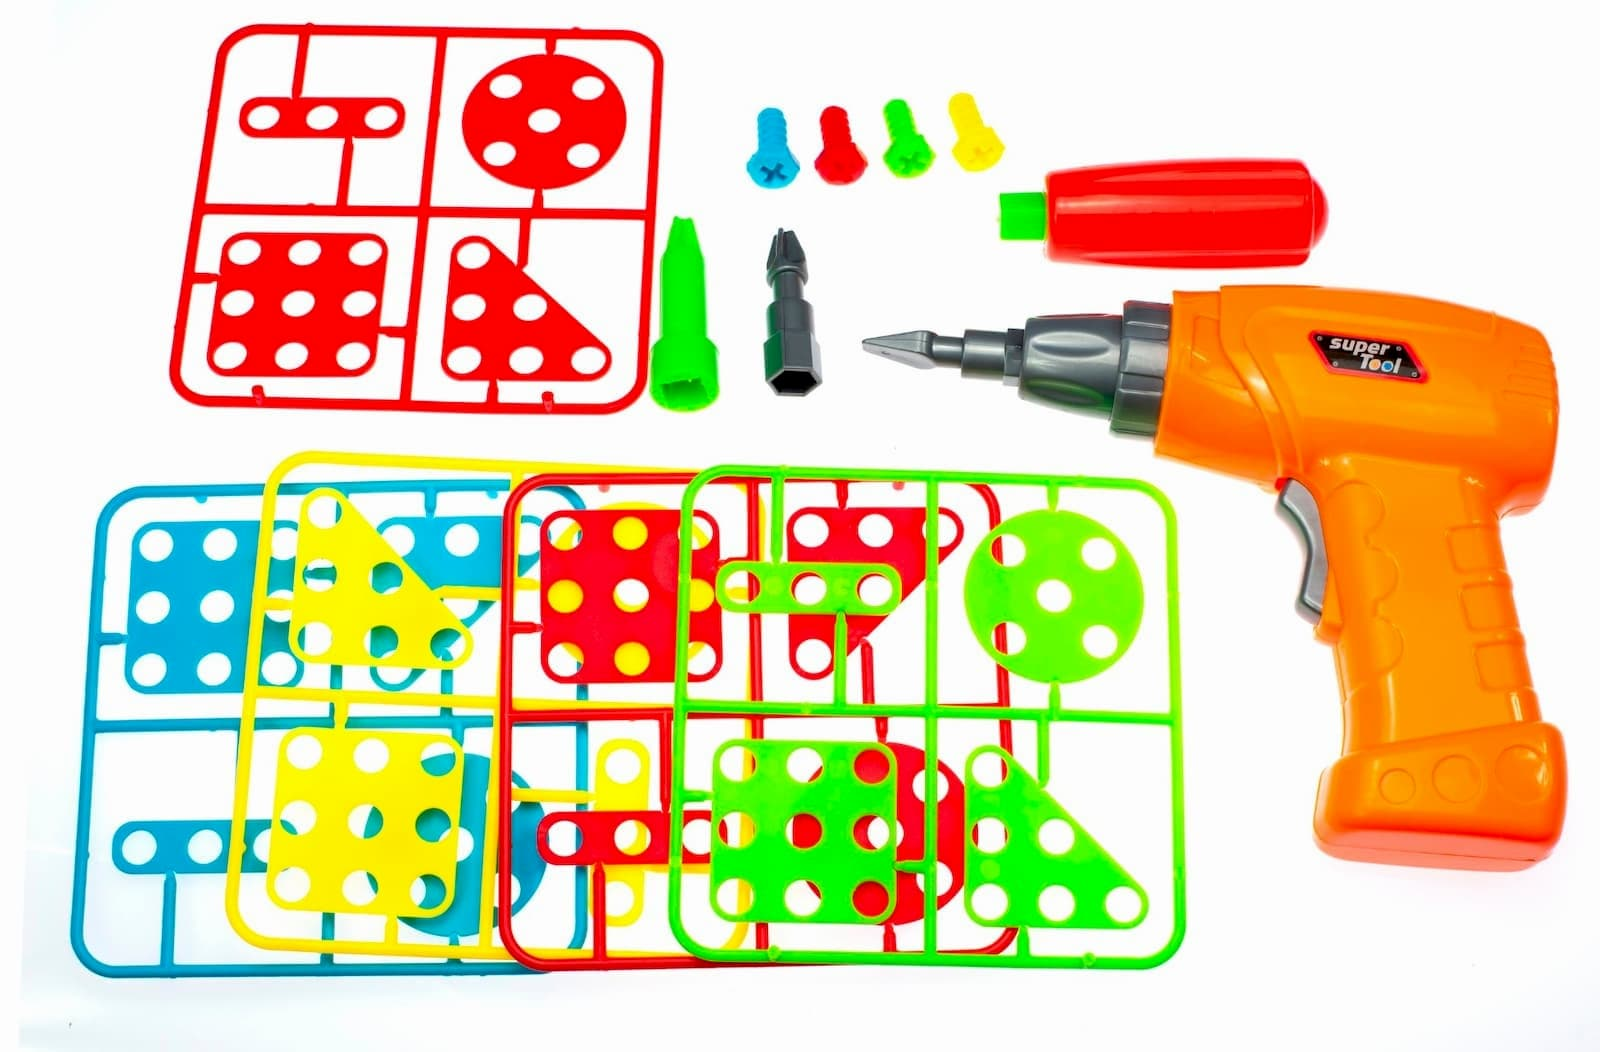 Конструктор-Мозаика Creative Magic Panel с шуруповертом и отверткой / 151 элемент